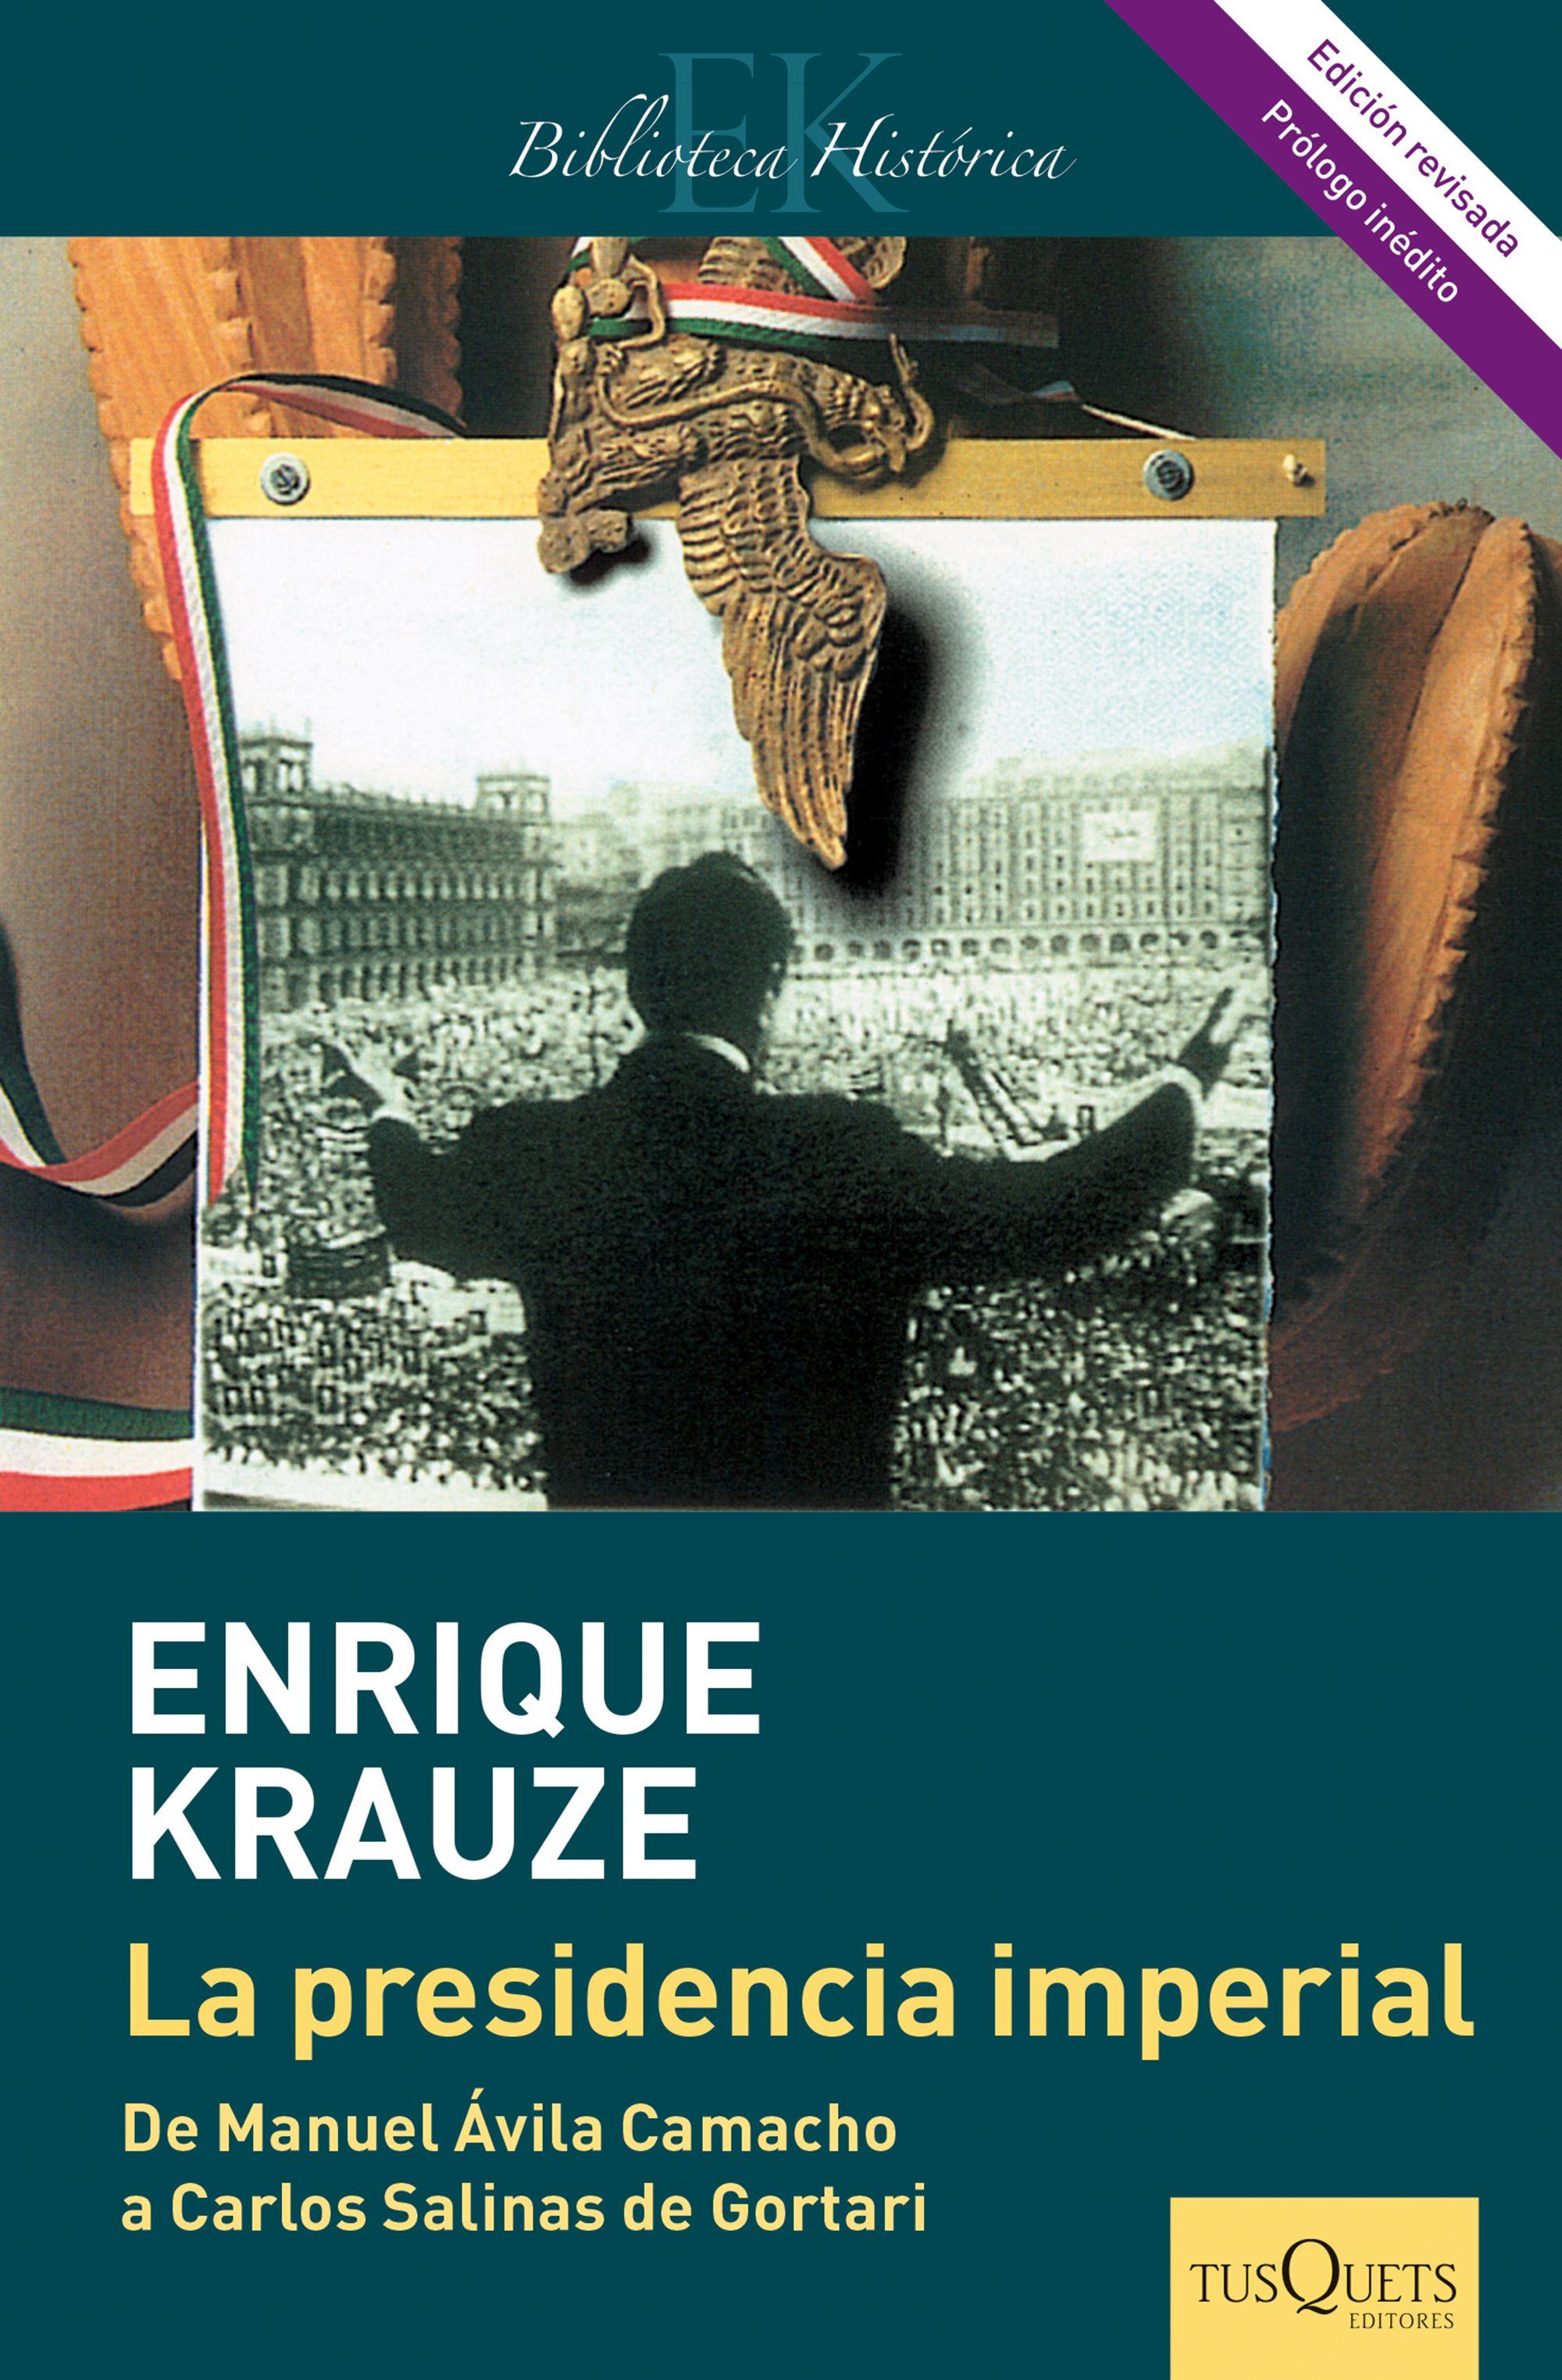 La presidencia imperial enrique krauze pdf converter